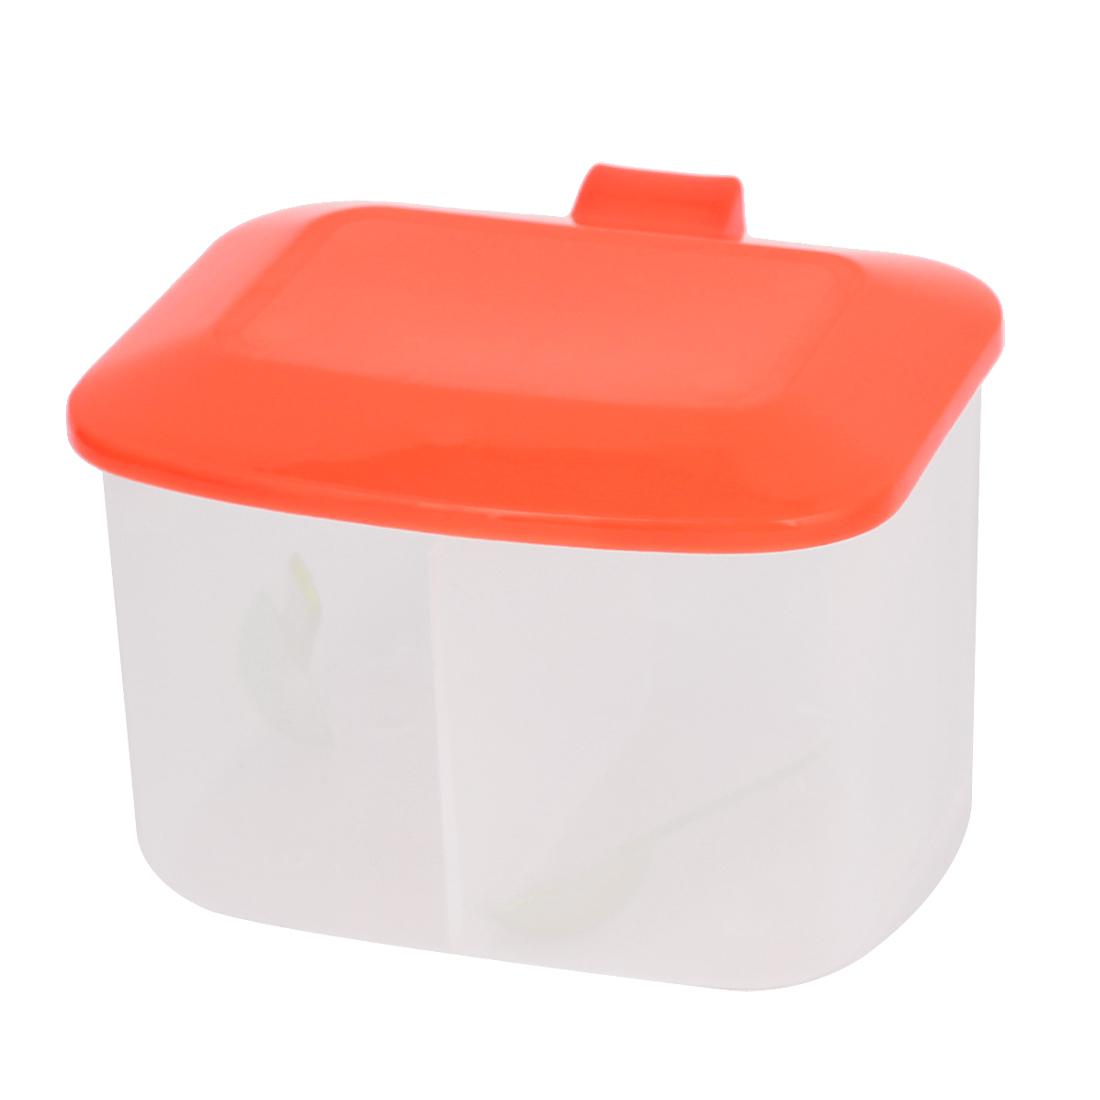 Orange Red Plastic 2 Seasoning Box Spices Condiment Container Case Holder w Spoons